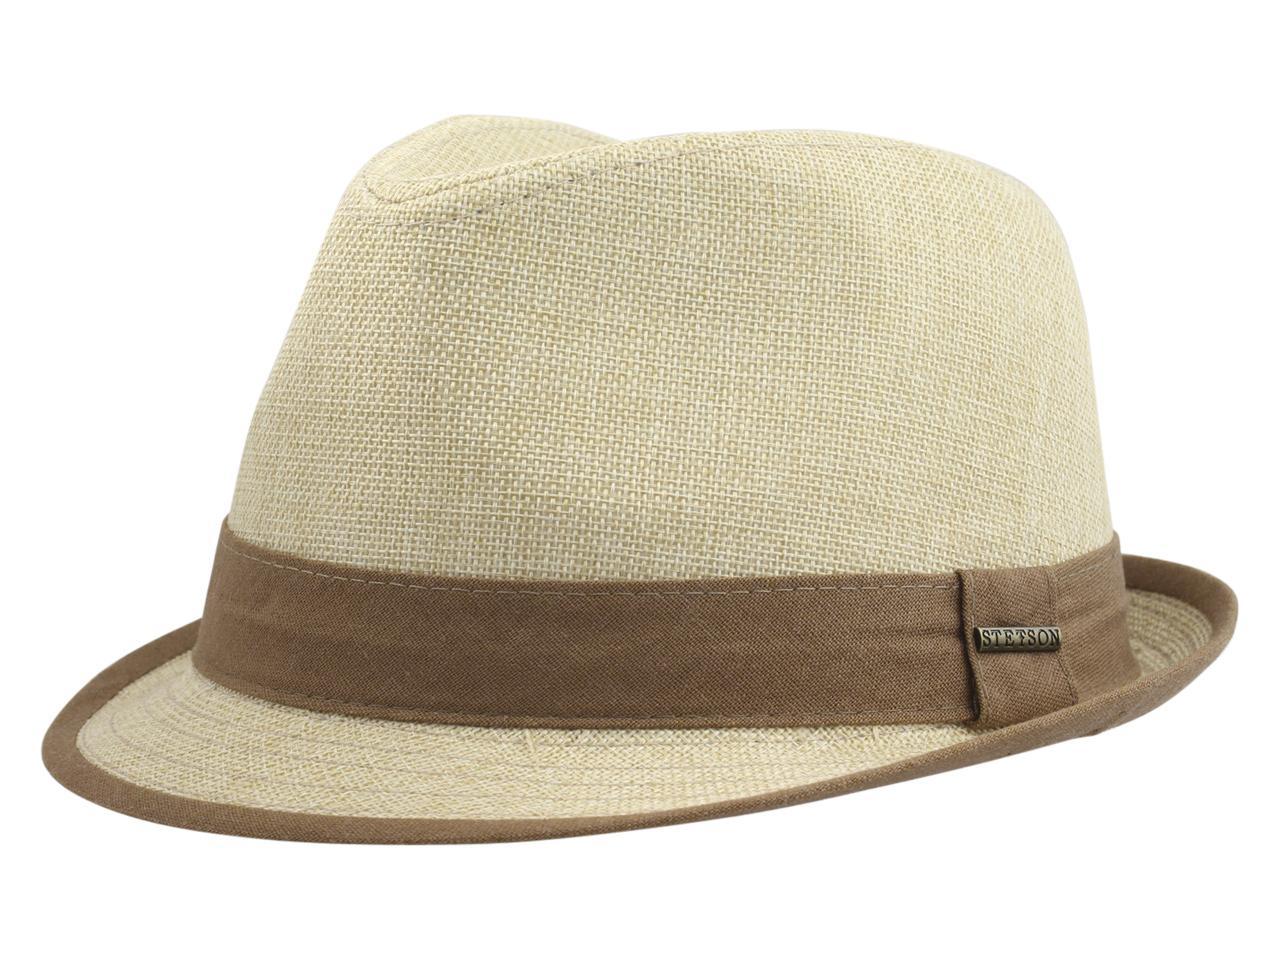 Image of Stetson Men's Contrast Trim Fedora Hat - Tea - X Large